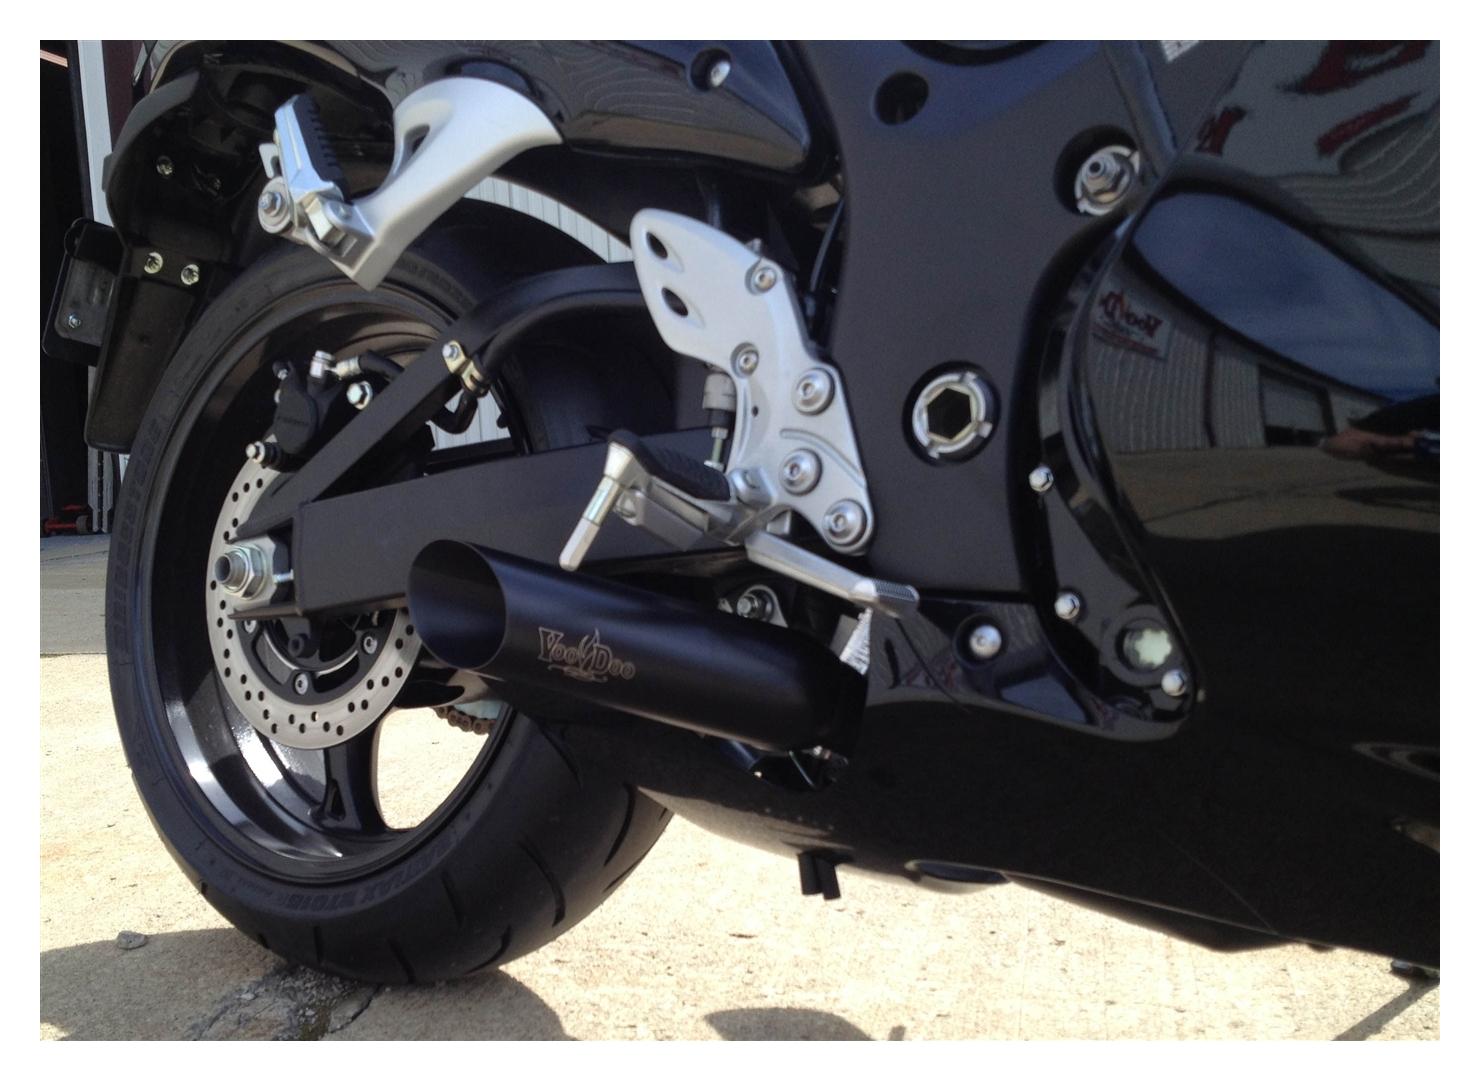 Voodoo Shorty Slip-On Exhaust Suzuki Hayabusa 2008-2019